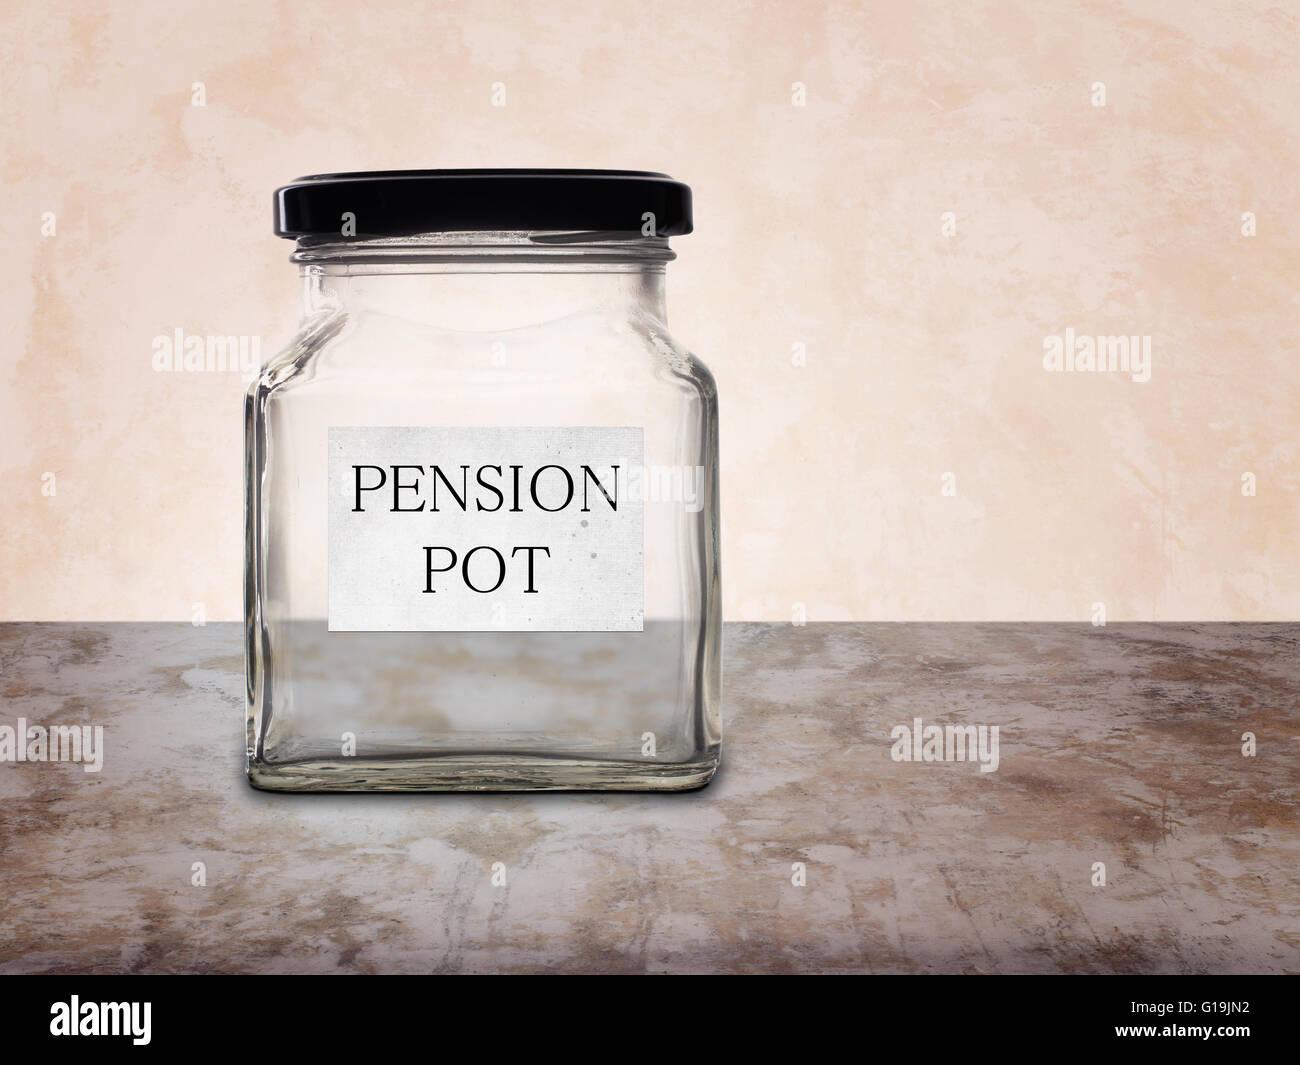 No pension pot. Empty jar. - Stock Image